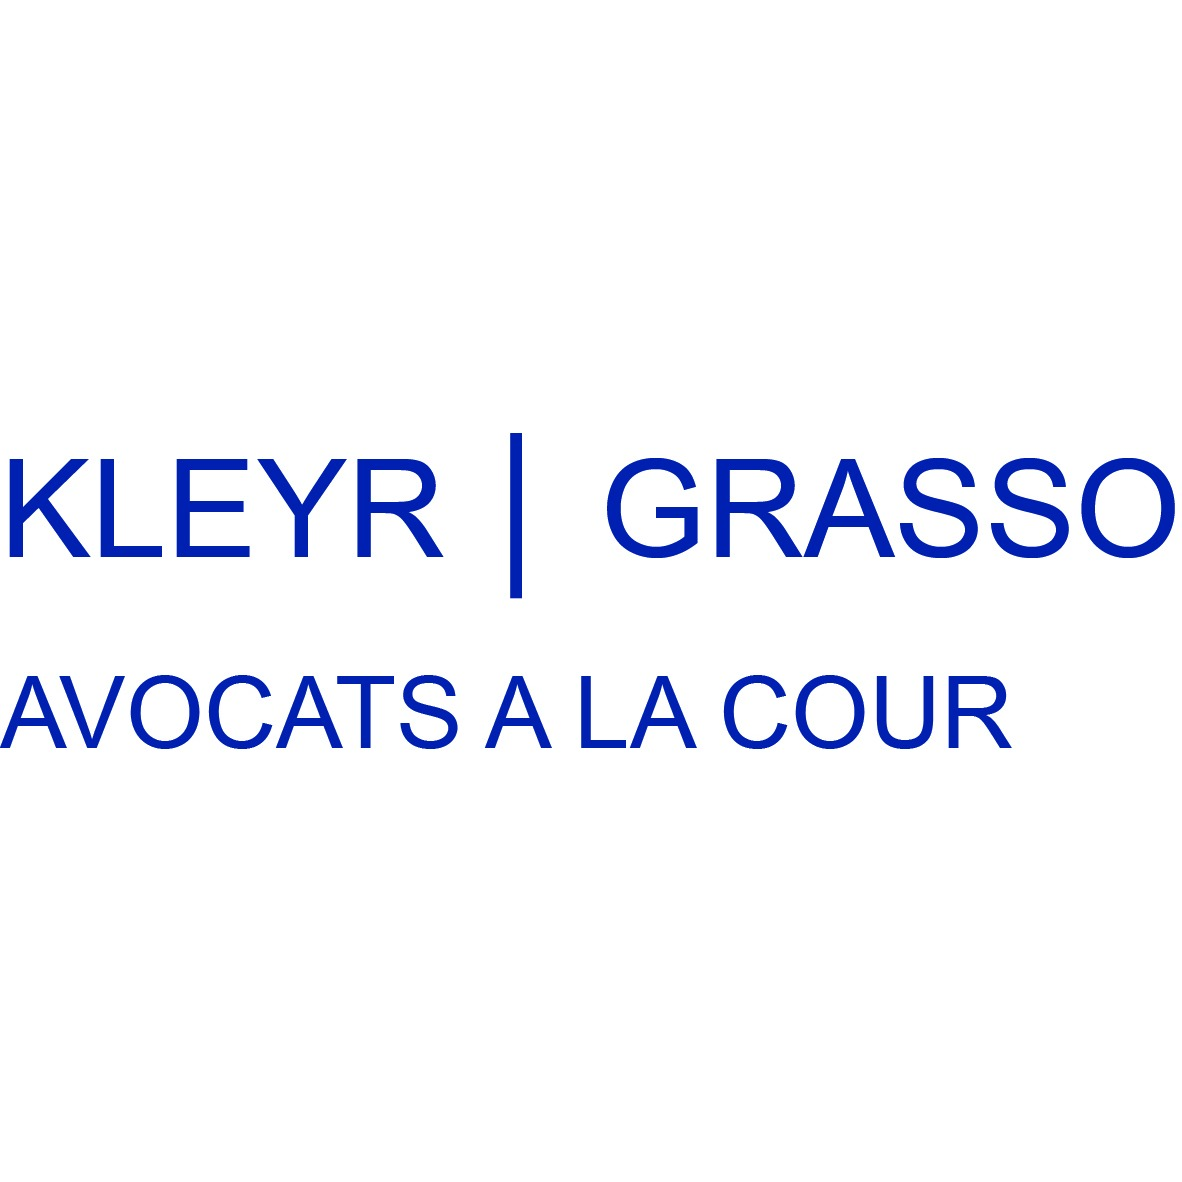 the Kleyr Grasso logo.